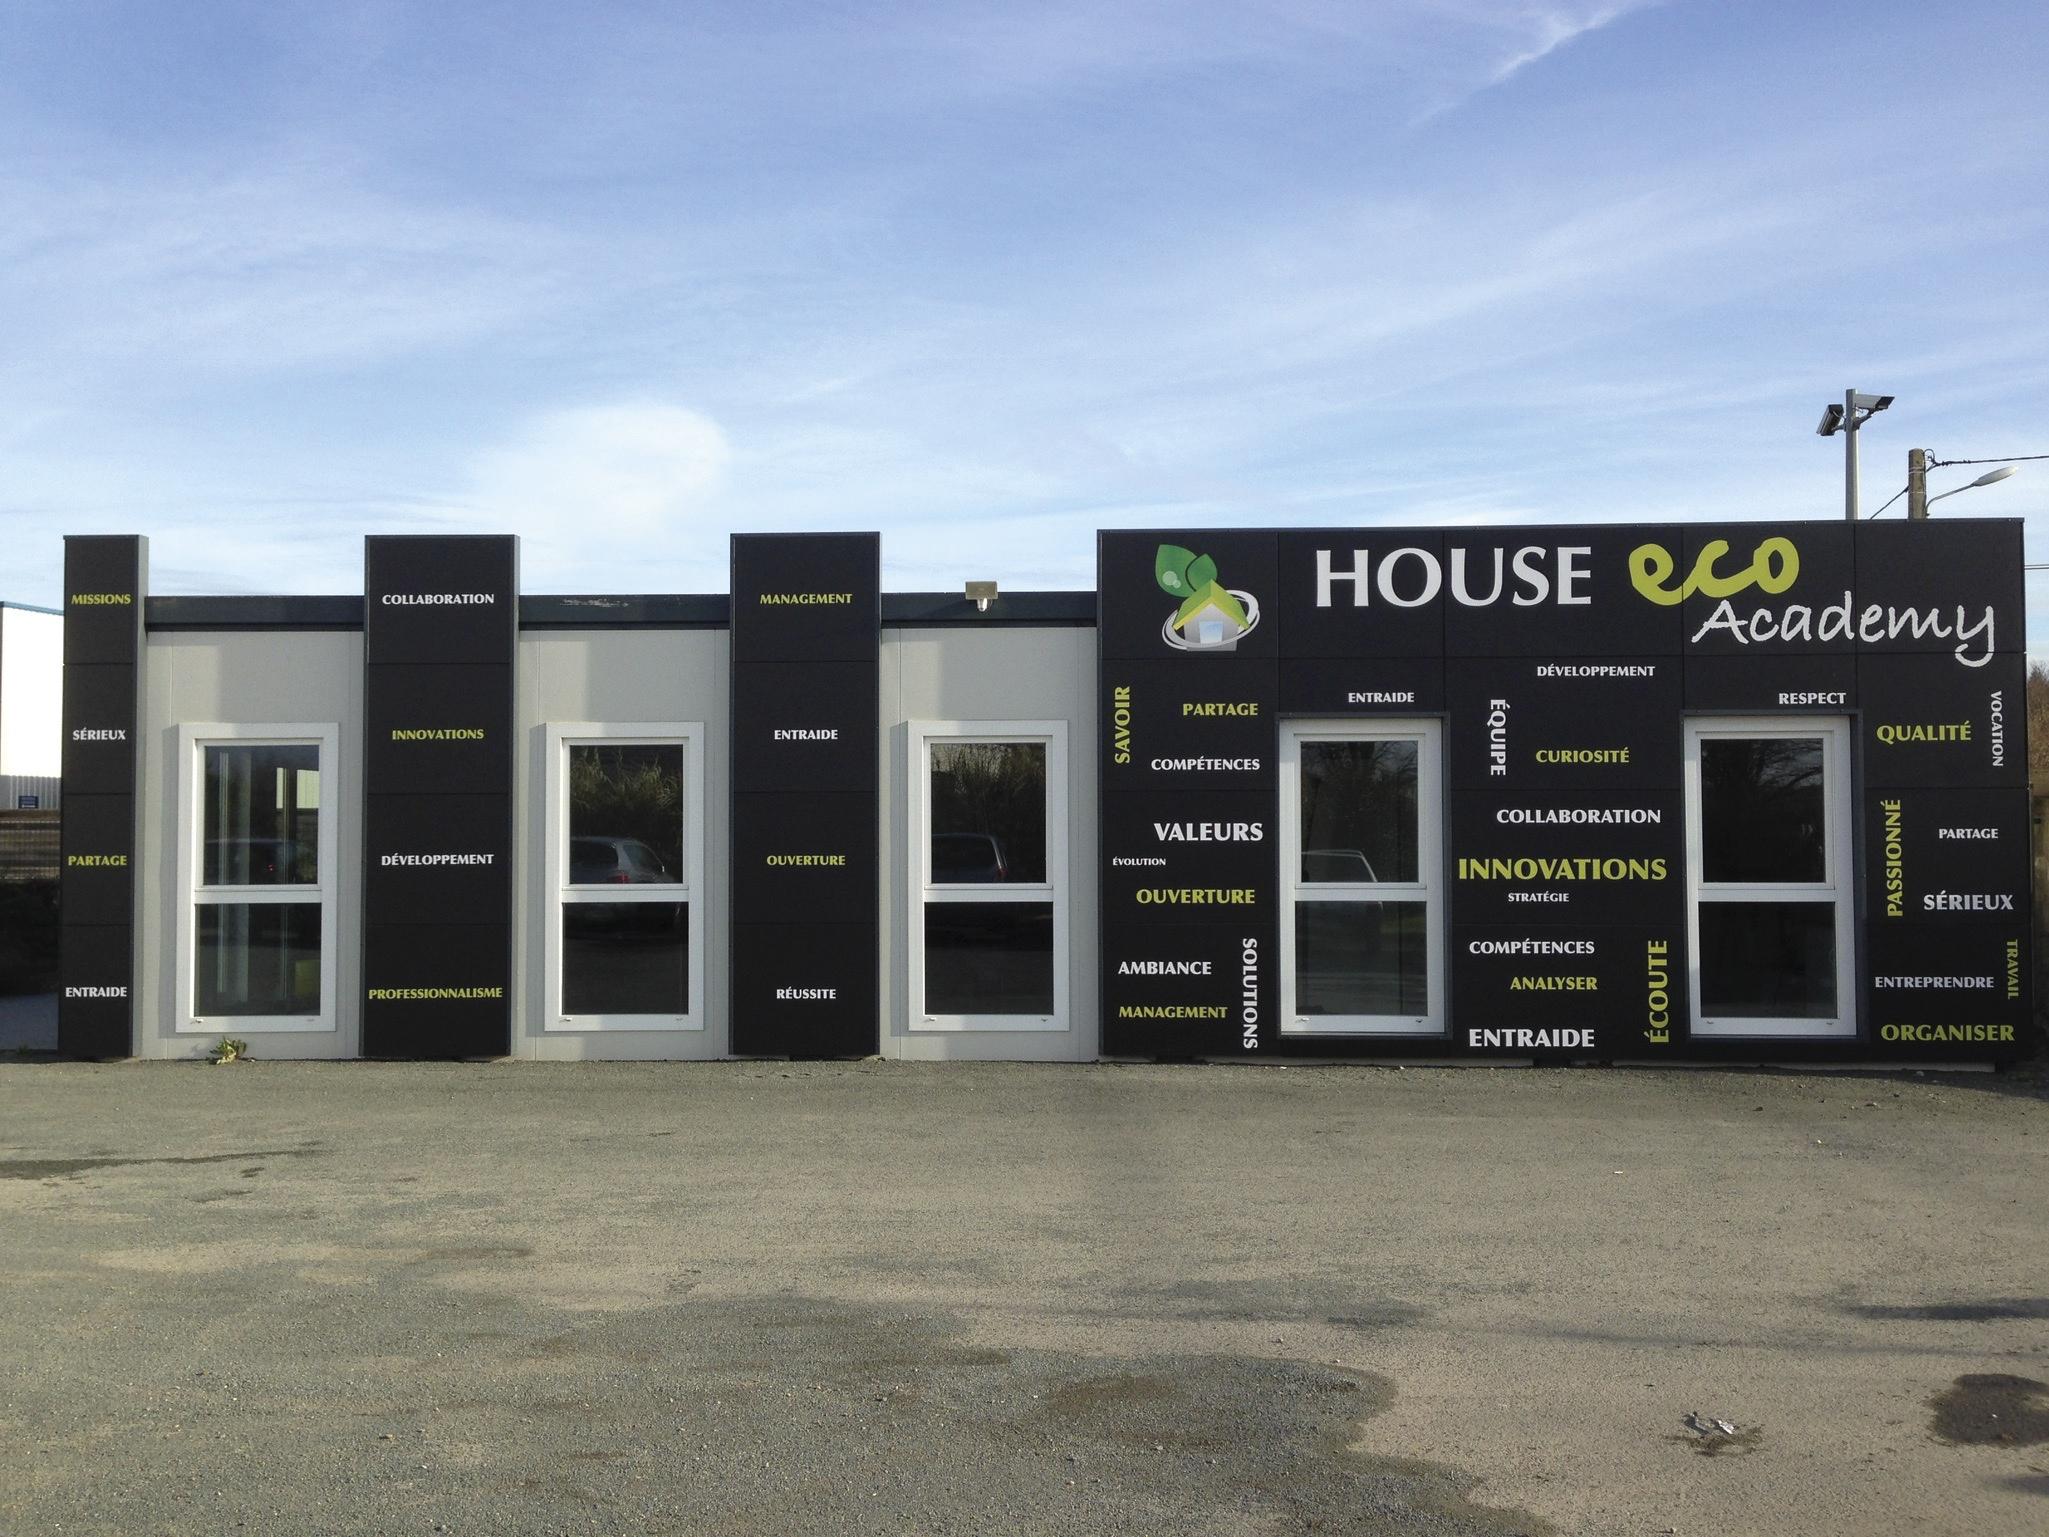 Facade du showroom House Eco à Angers